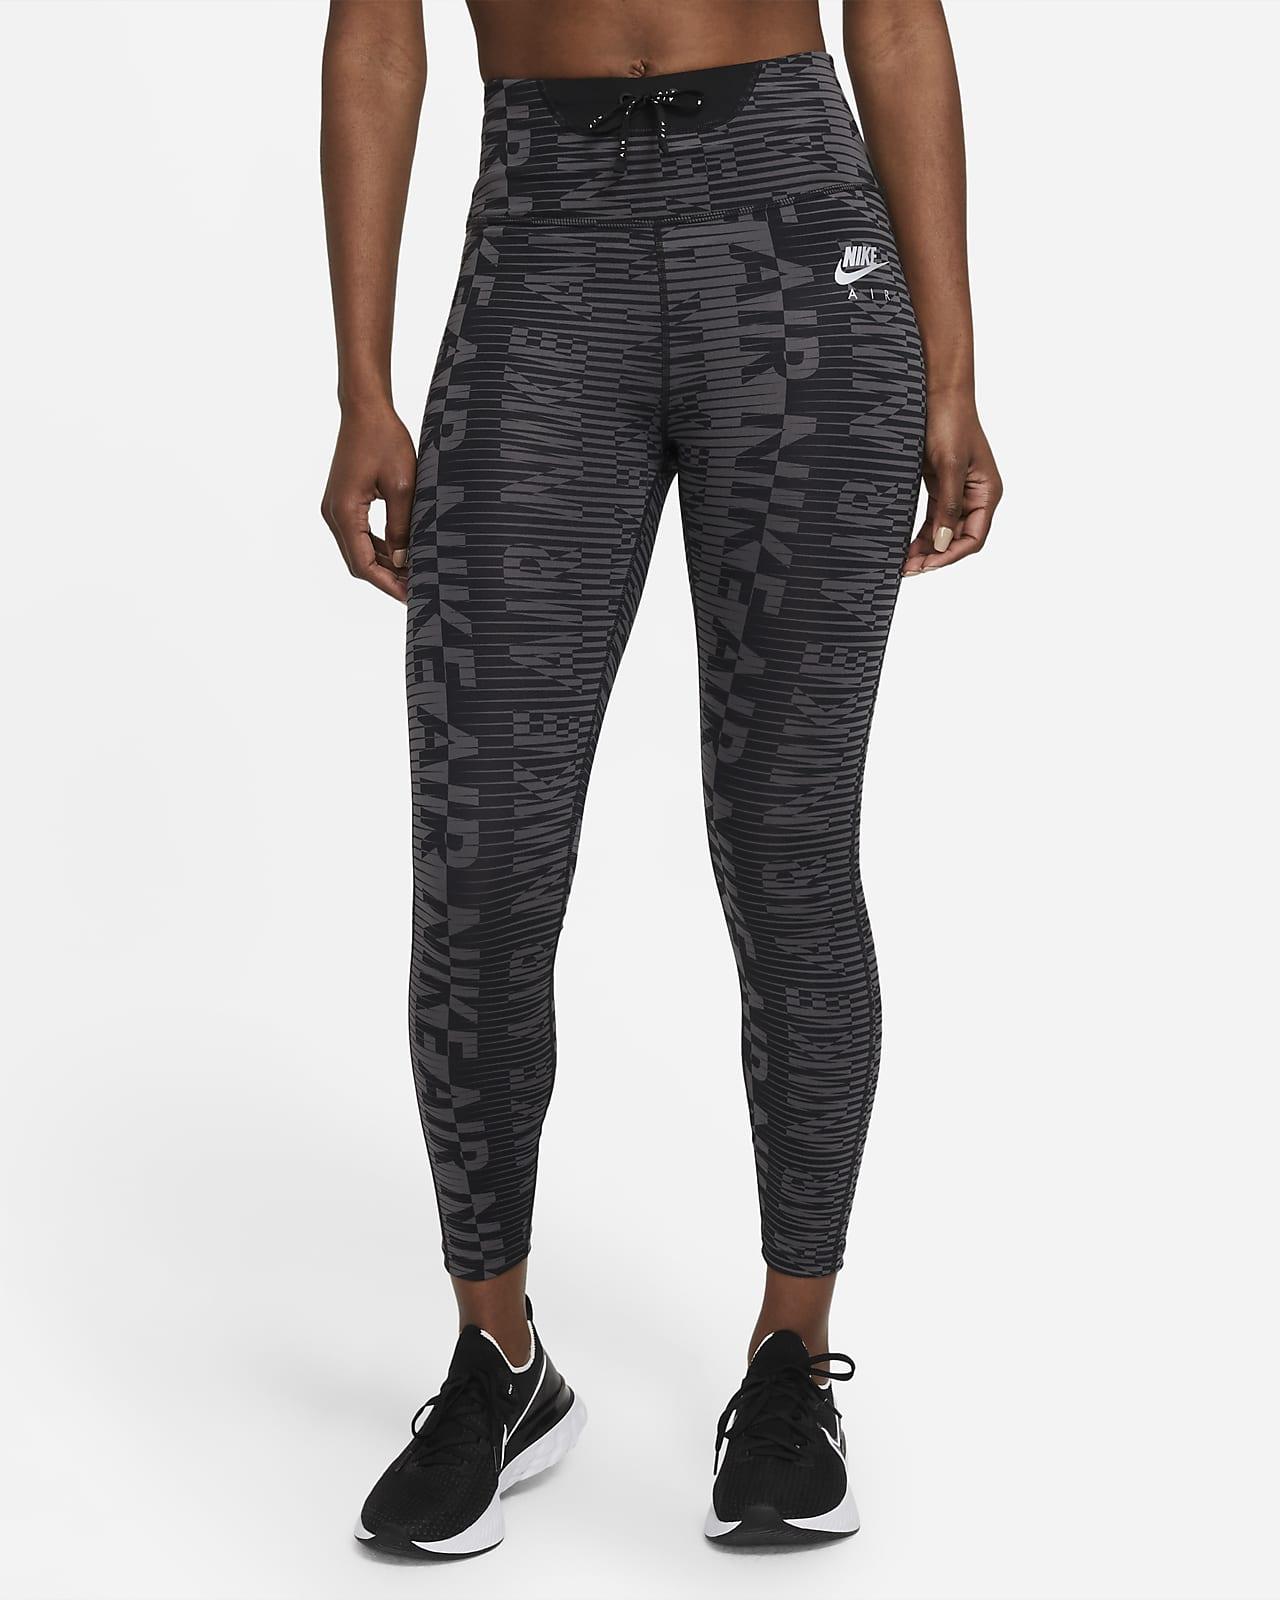 Nike Air Epic Fast Women's High-Rise 7/8 Printed Running Leggings